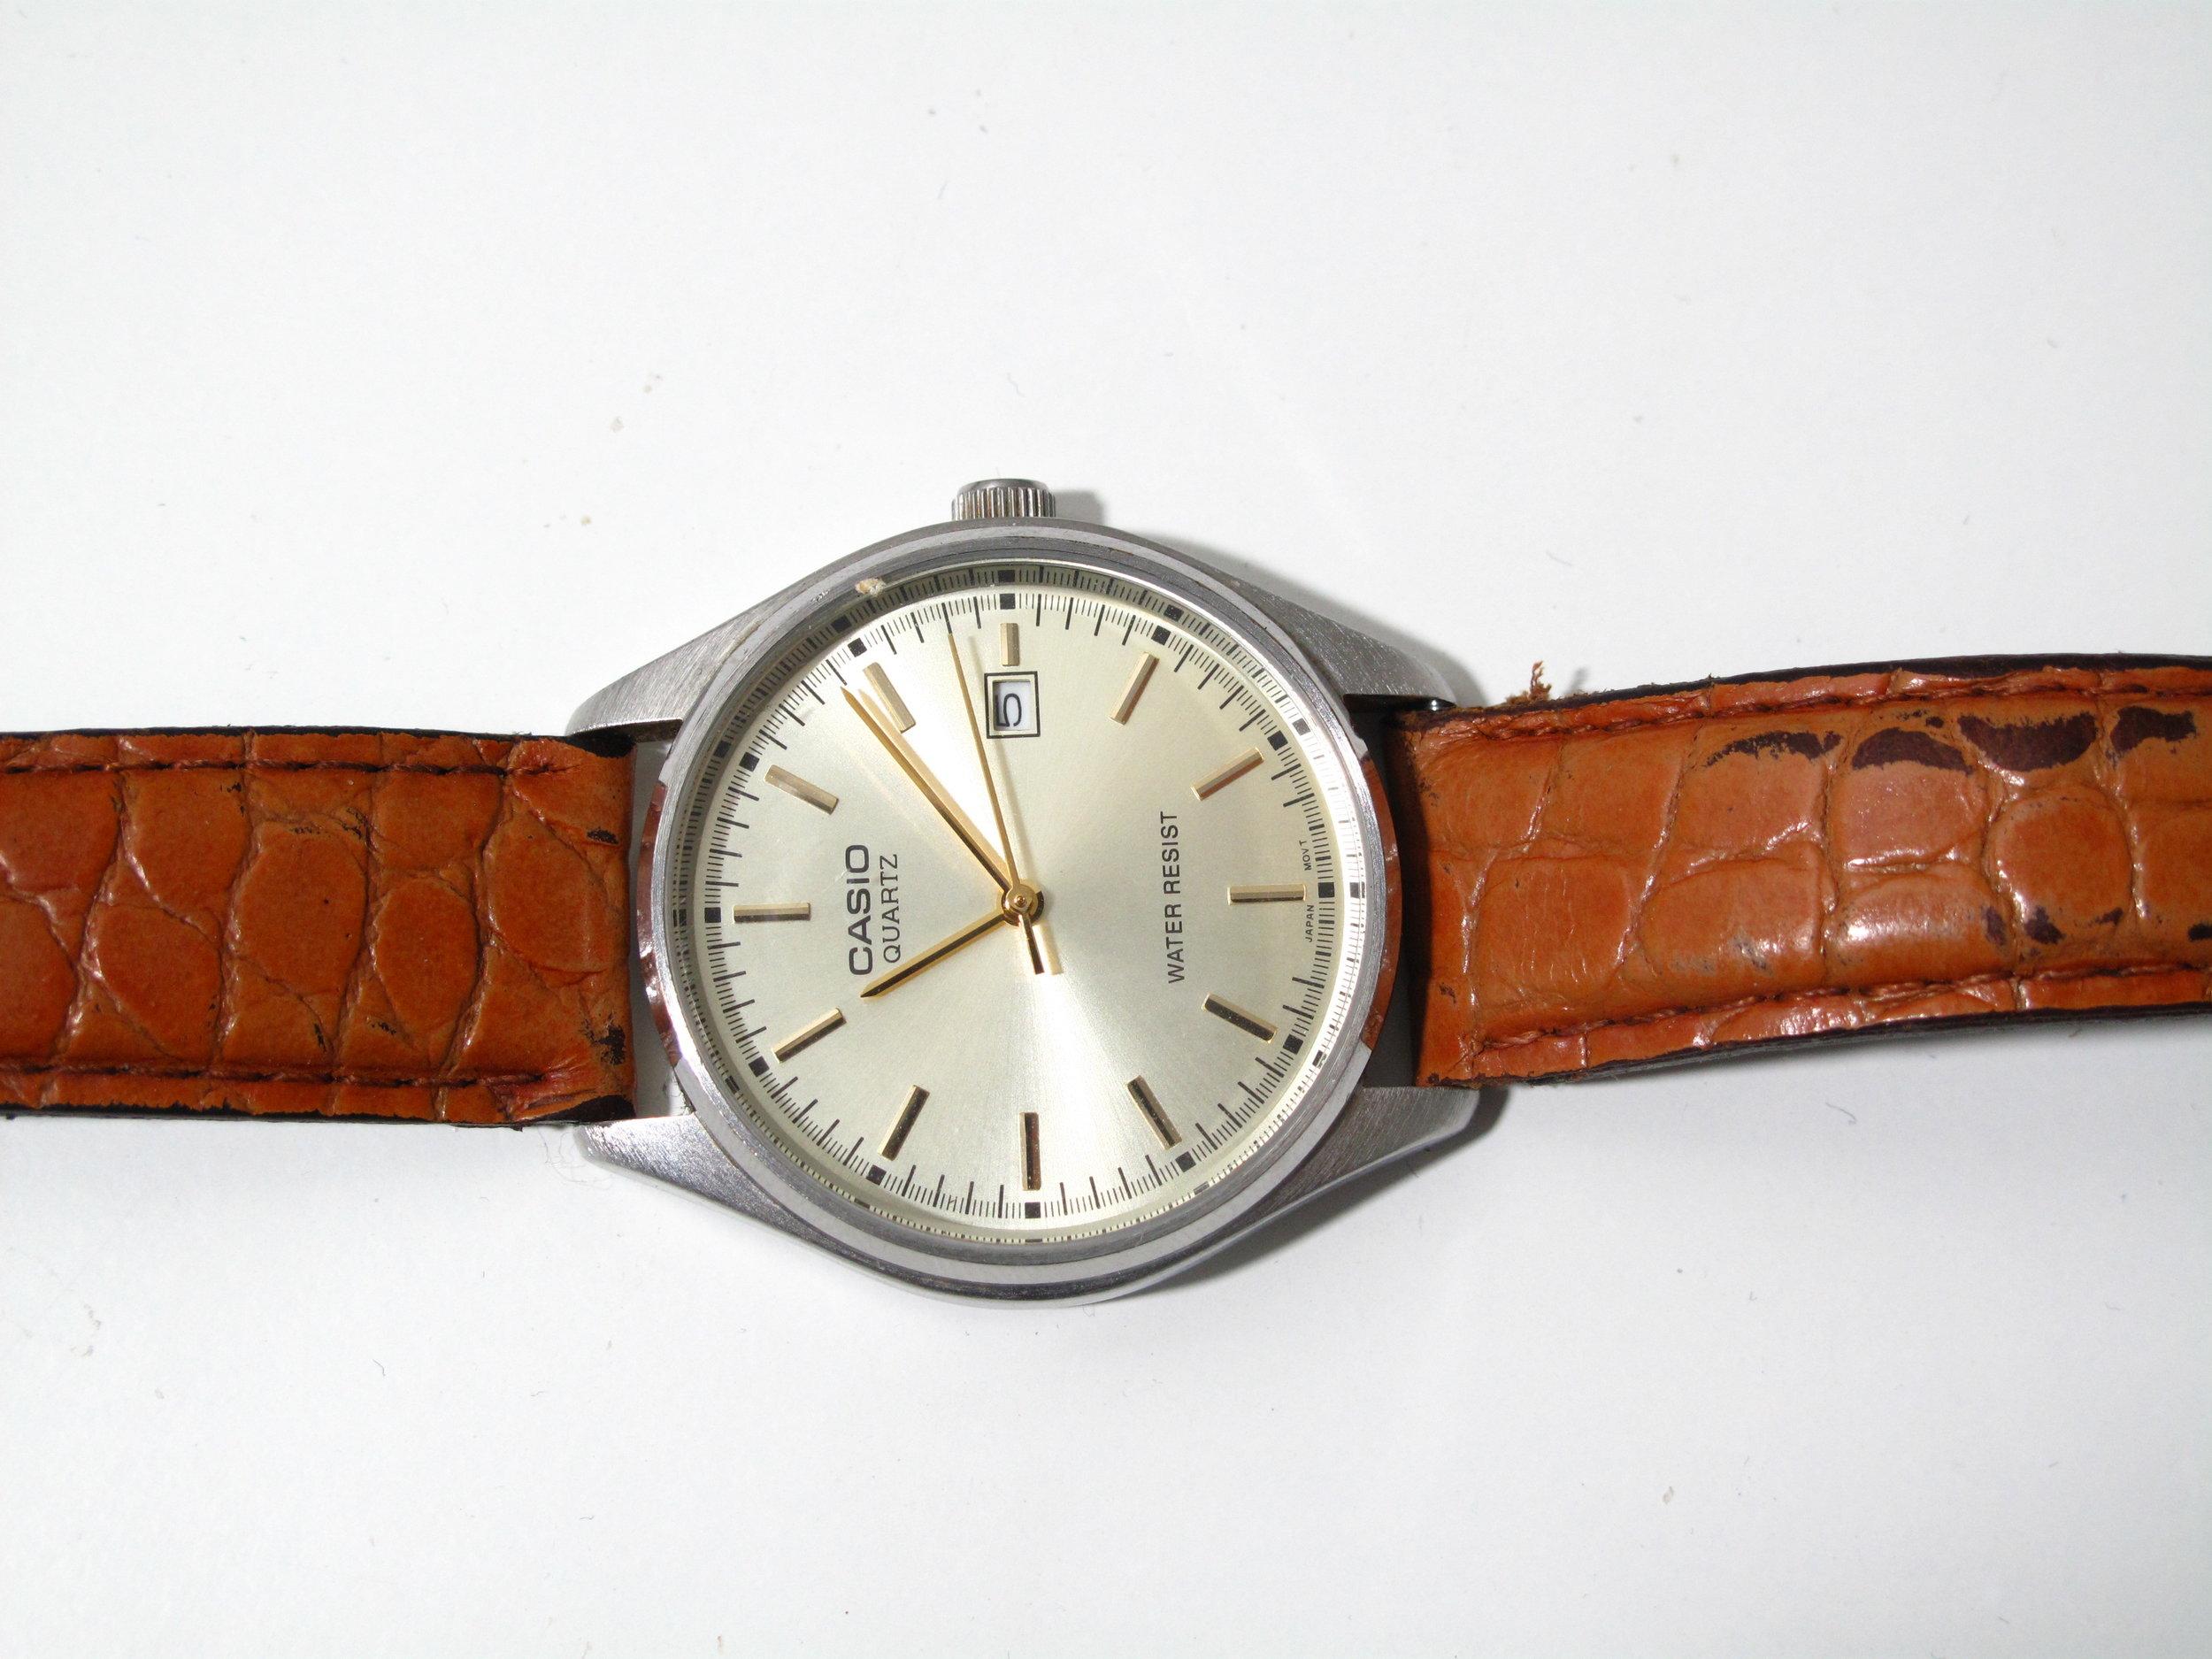 Casio-montre_cuir